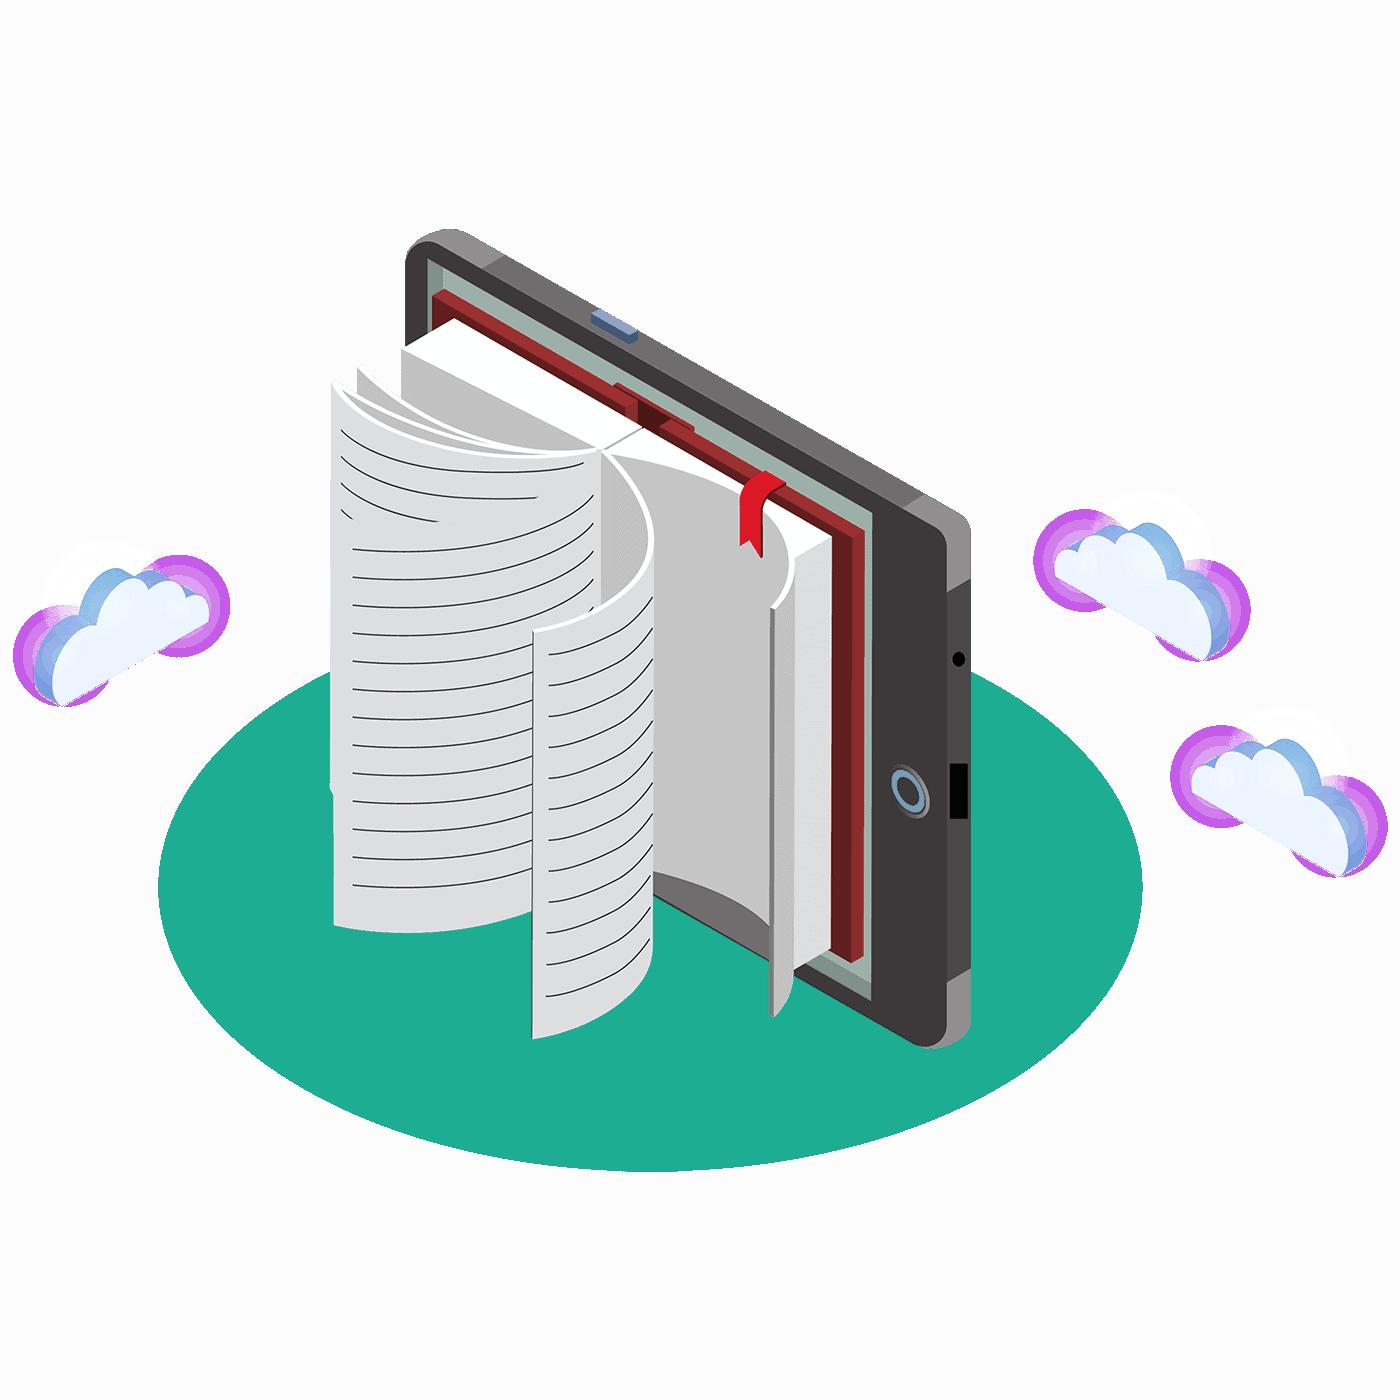 Audiobooks vs eBooks